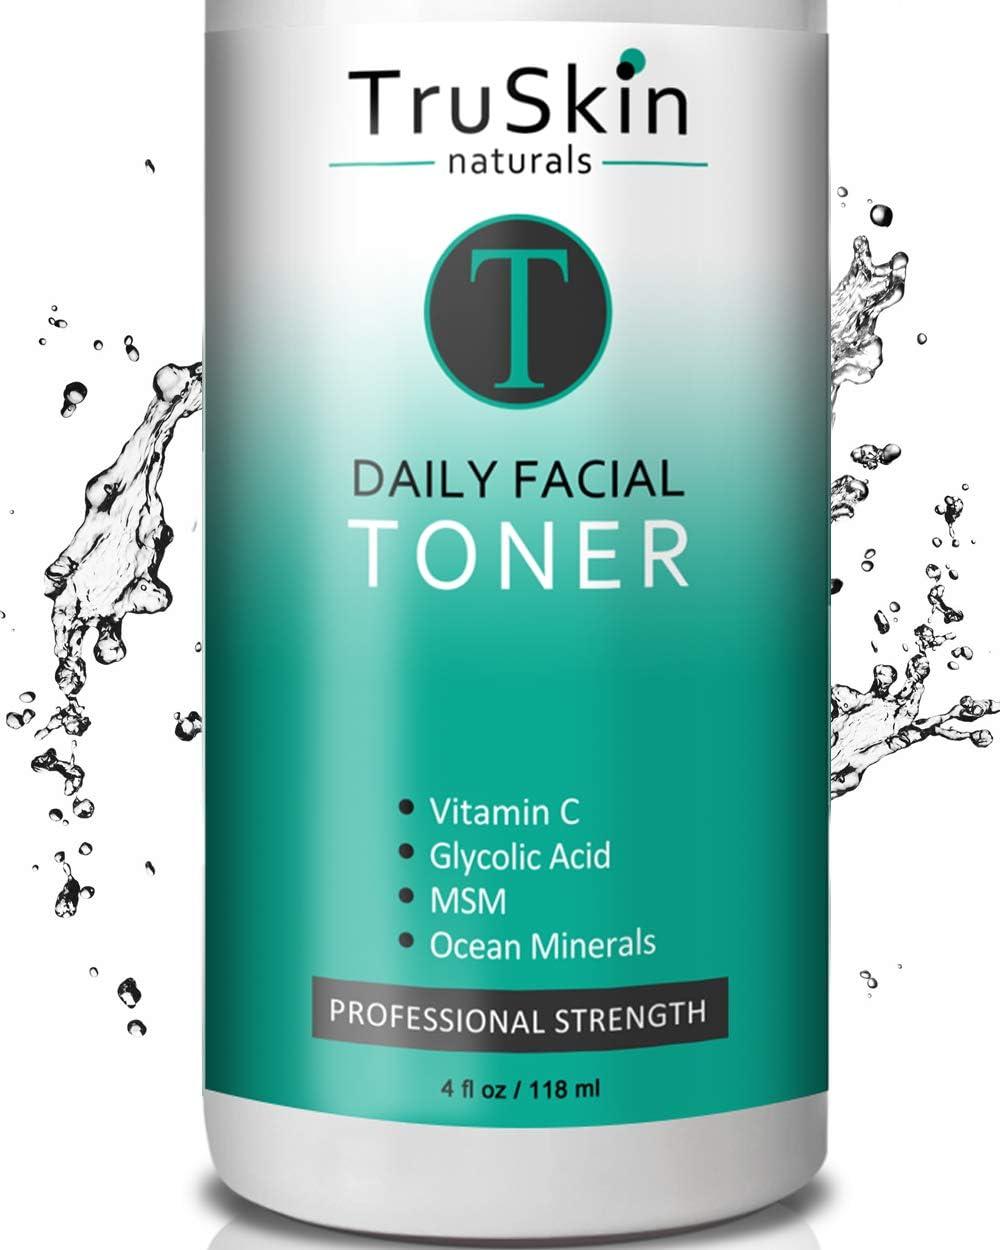 TruSkin Daily Facial Super Toner